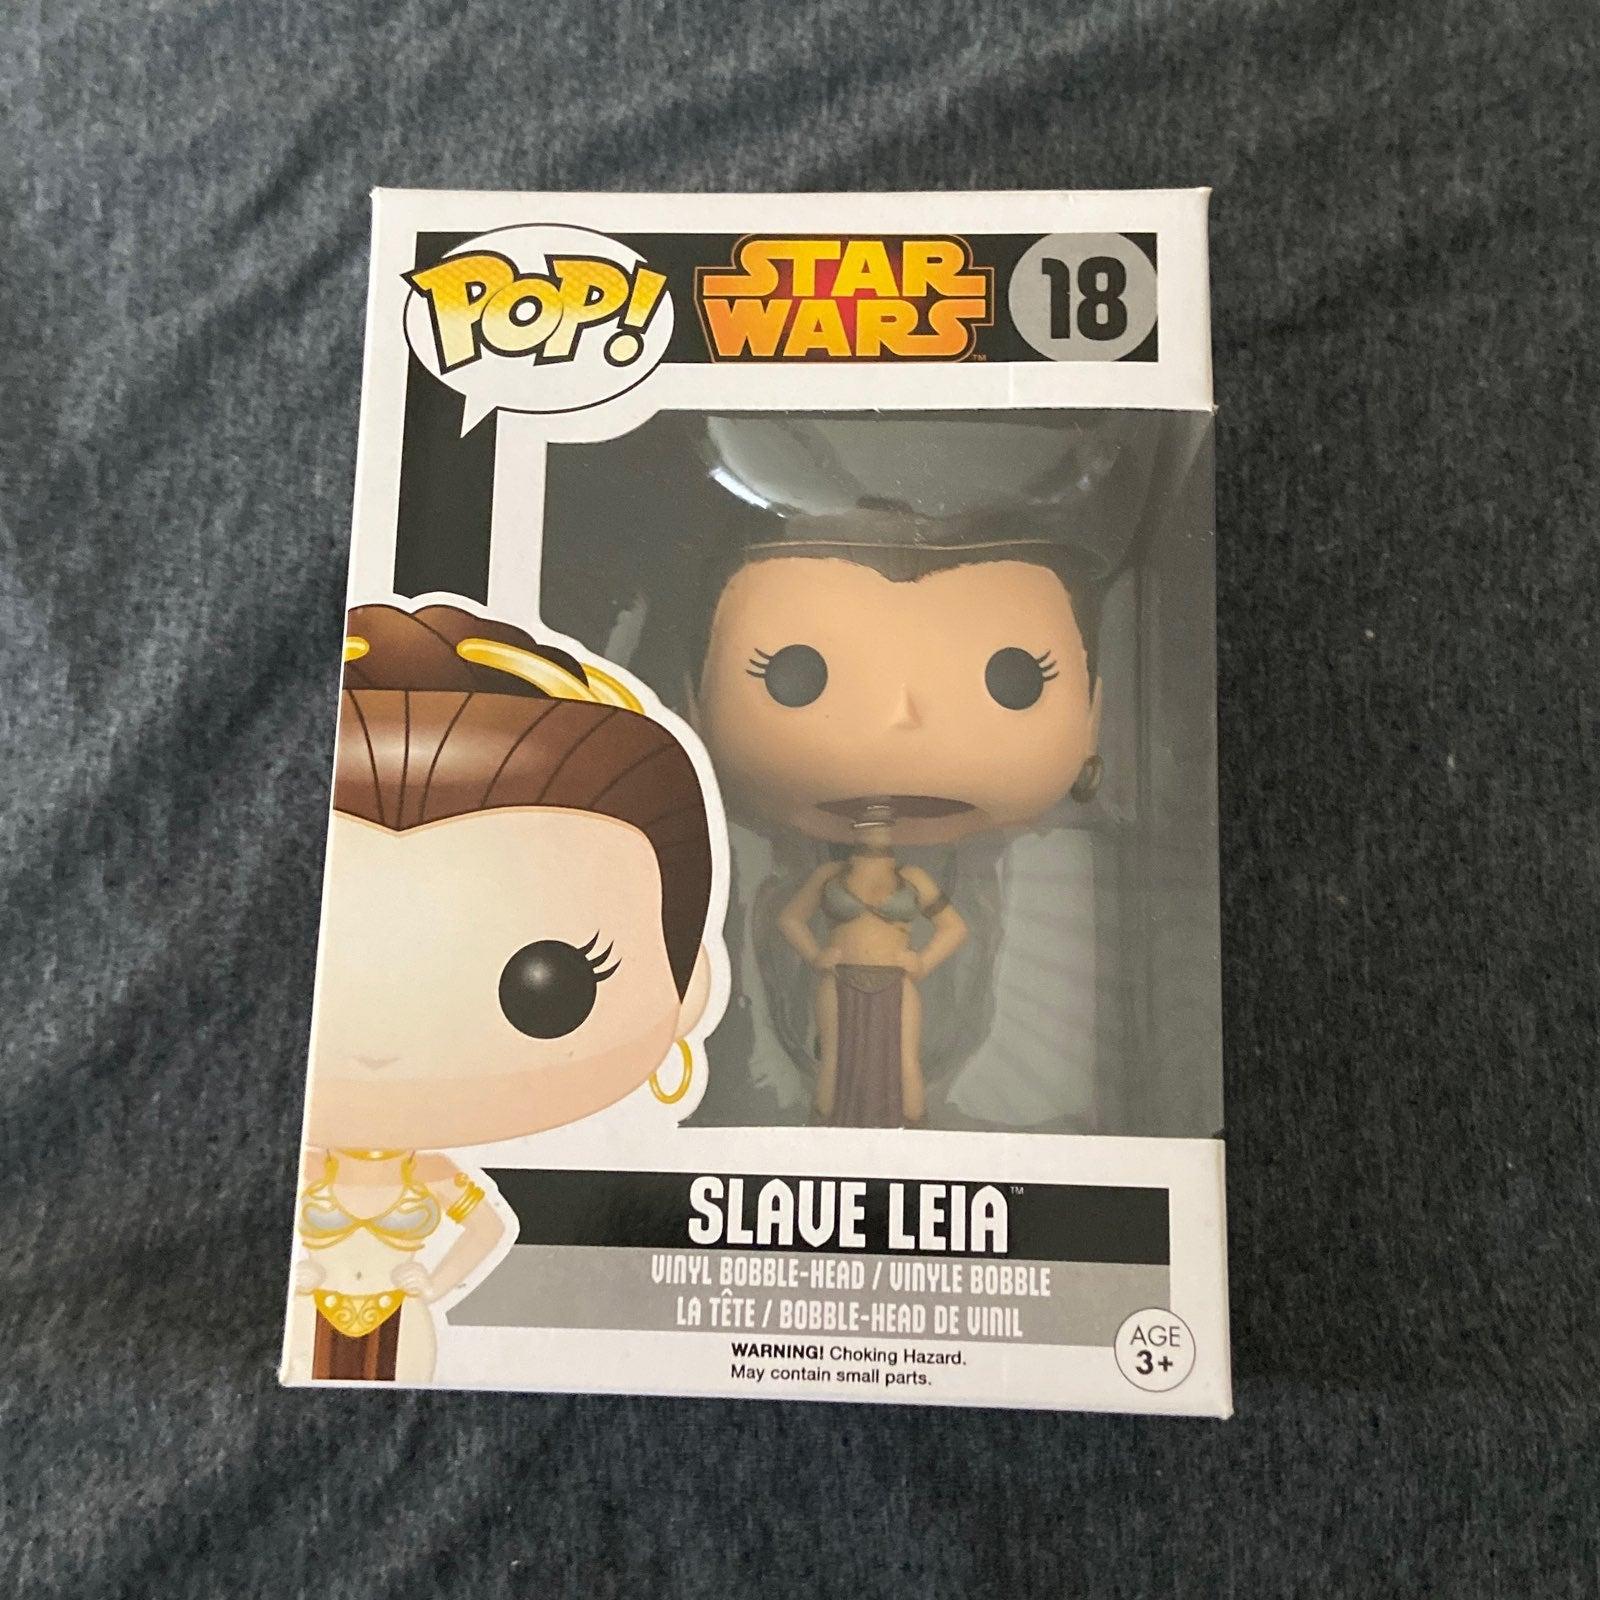 Star Wars Leia Organa (Slave) Funko Pop